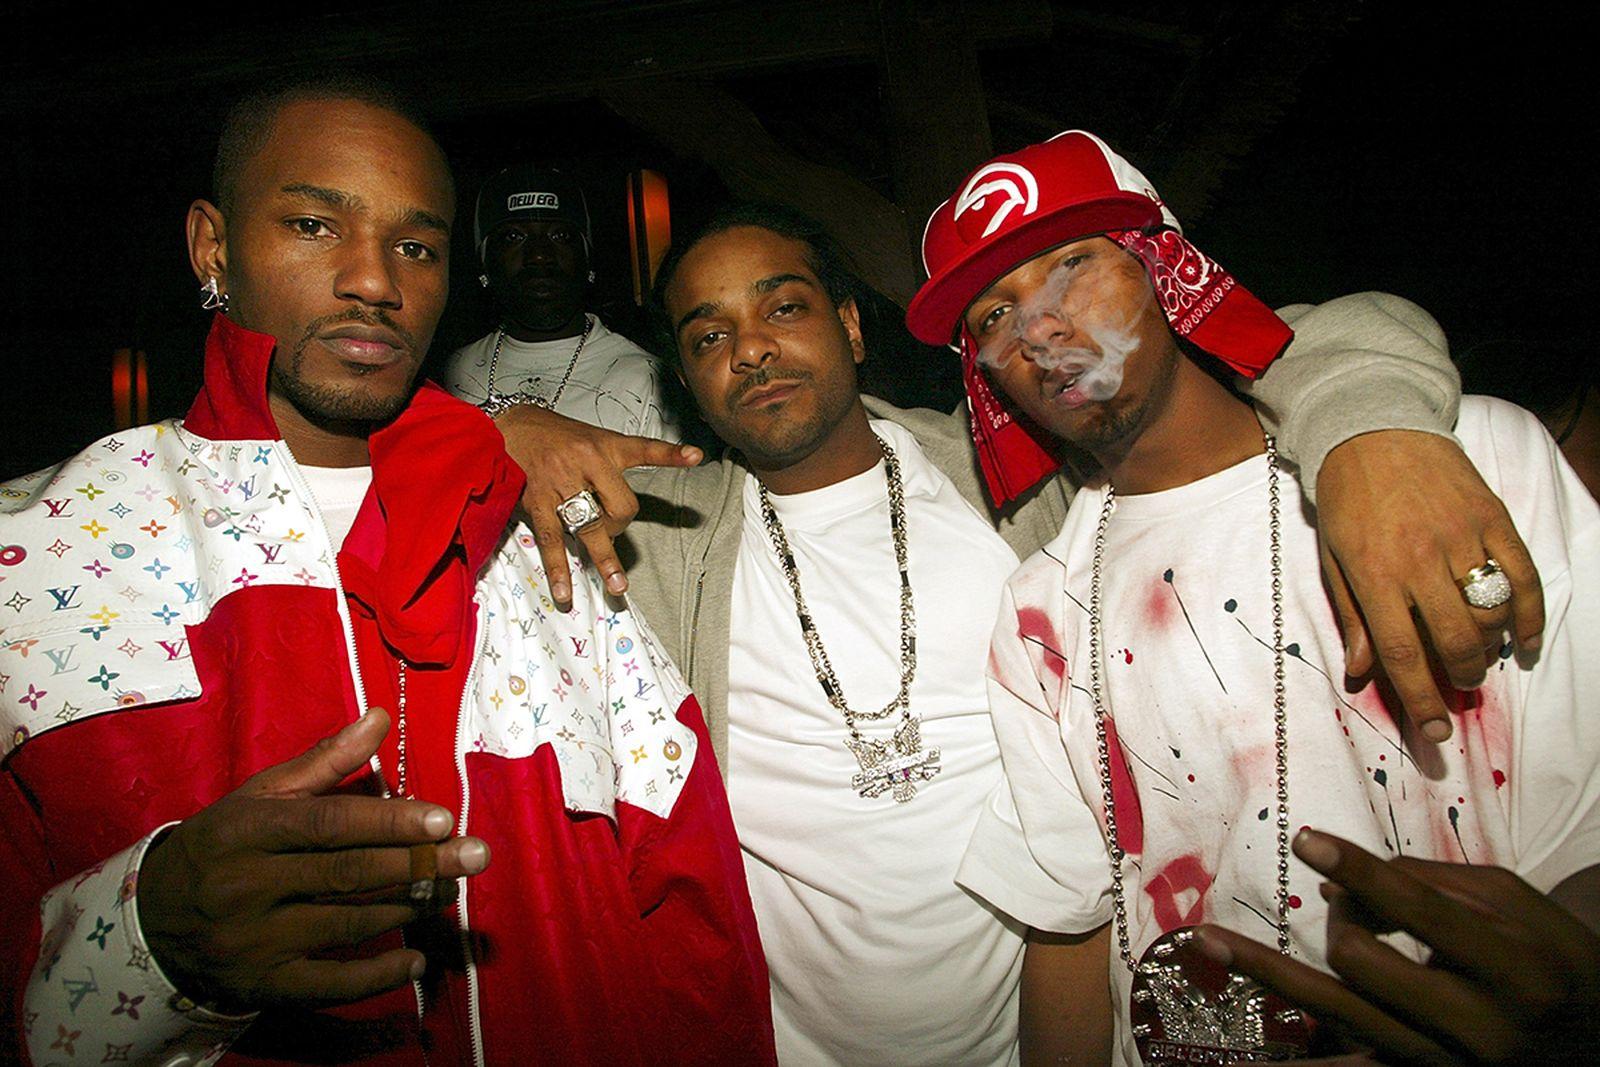 how marijuana hip hop became inseparable 420 N.W.A. beastie boys